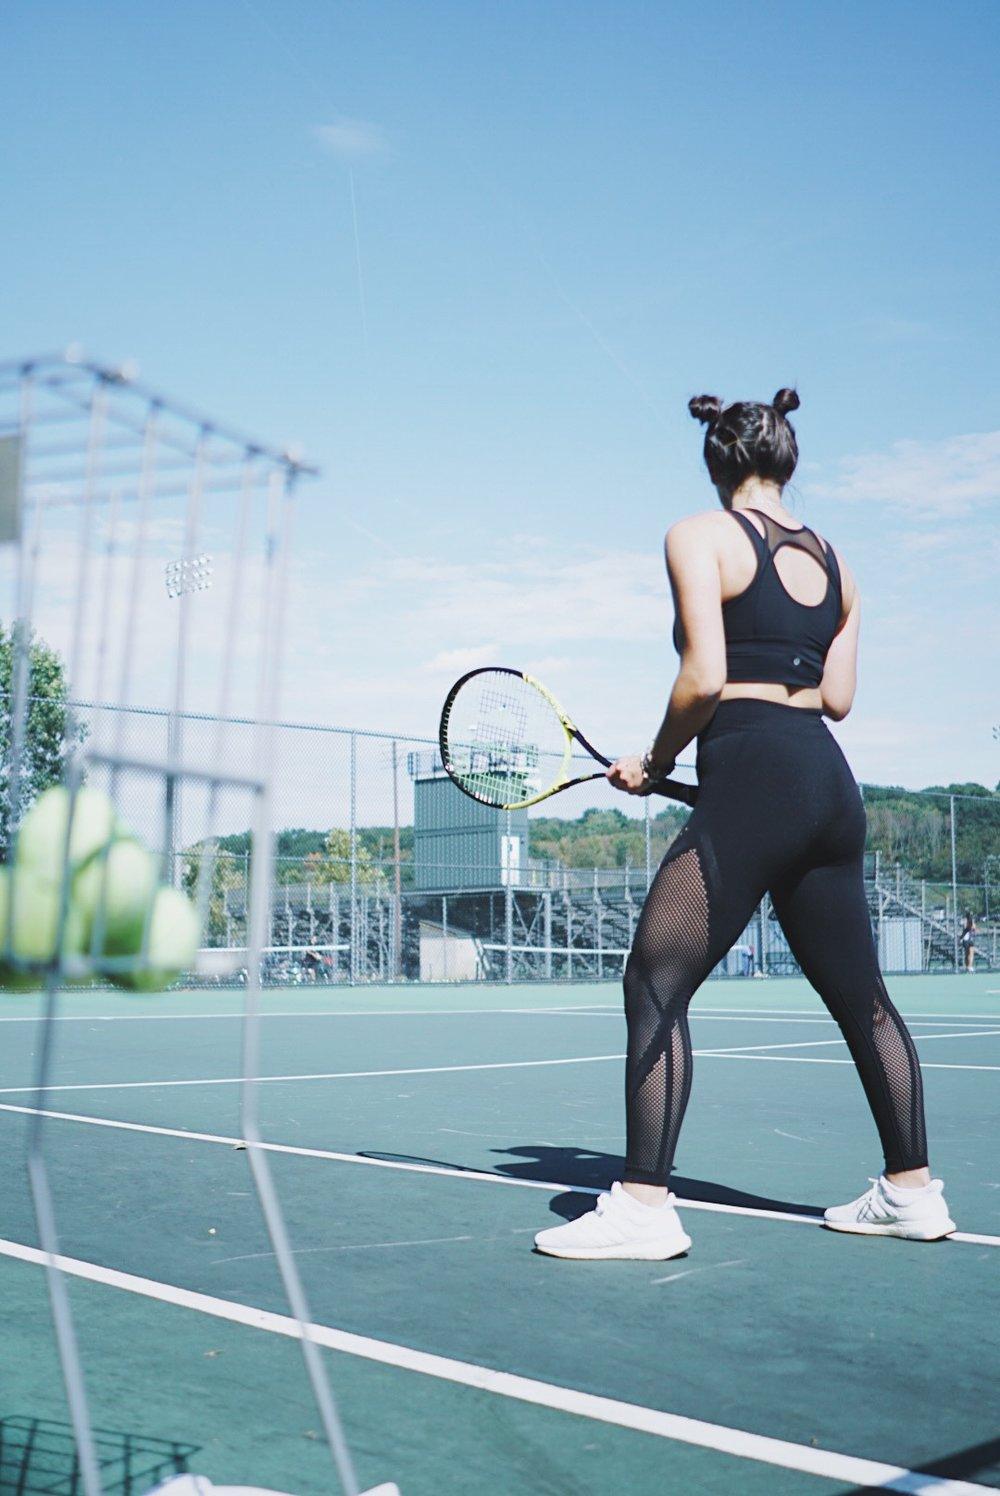 tennis fitness model adidas warpknit ultraboost athleisure